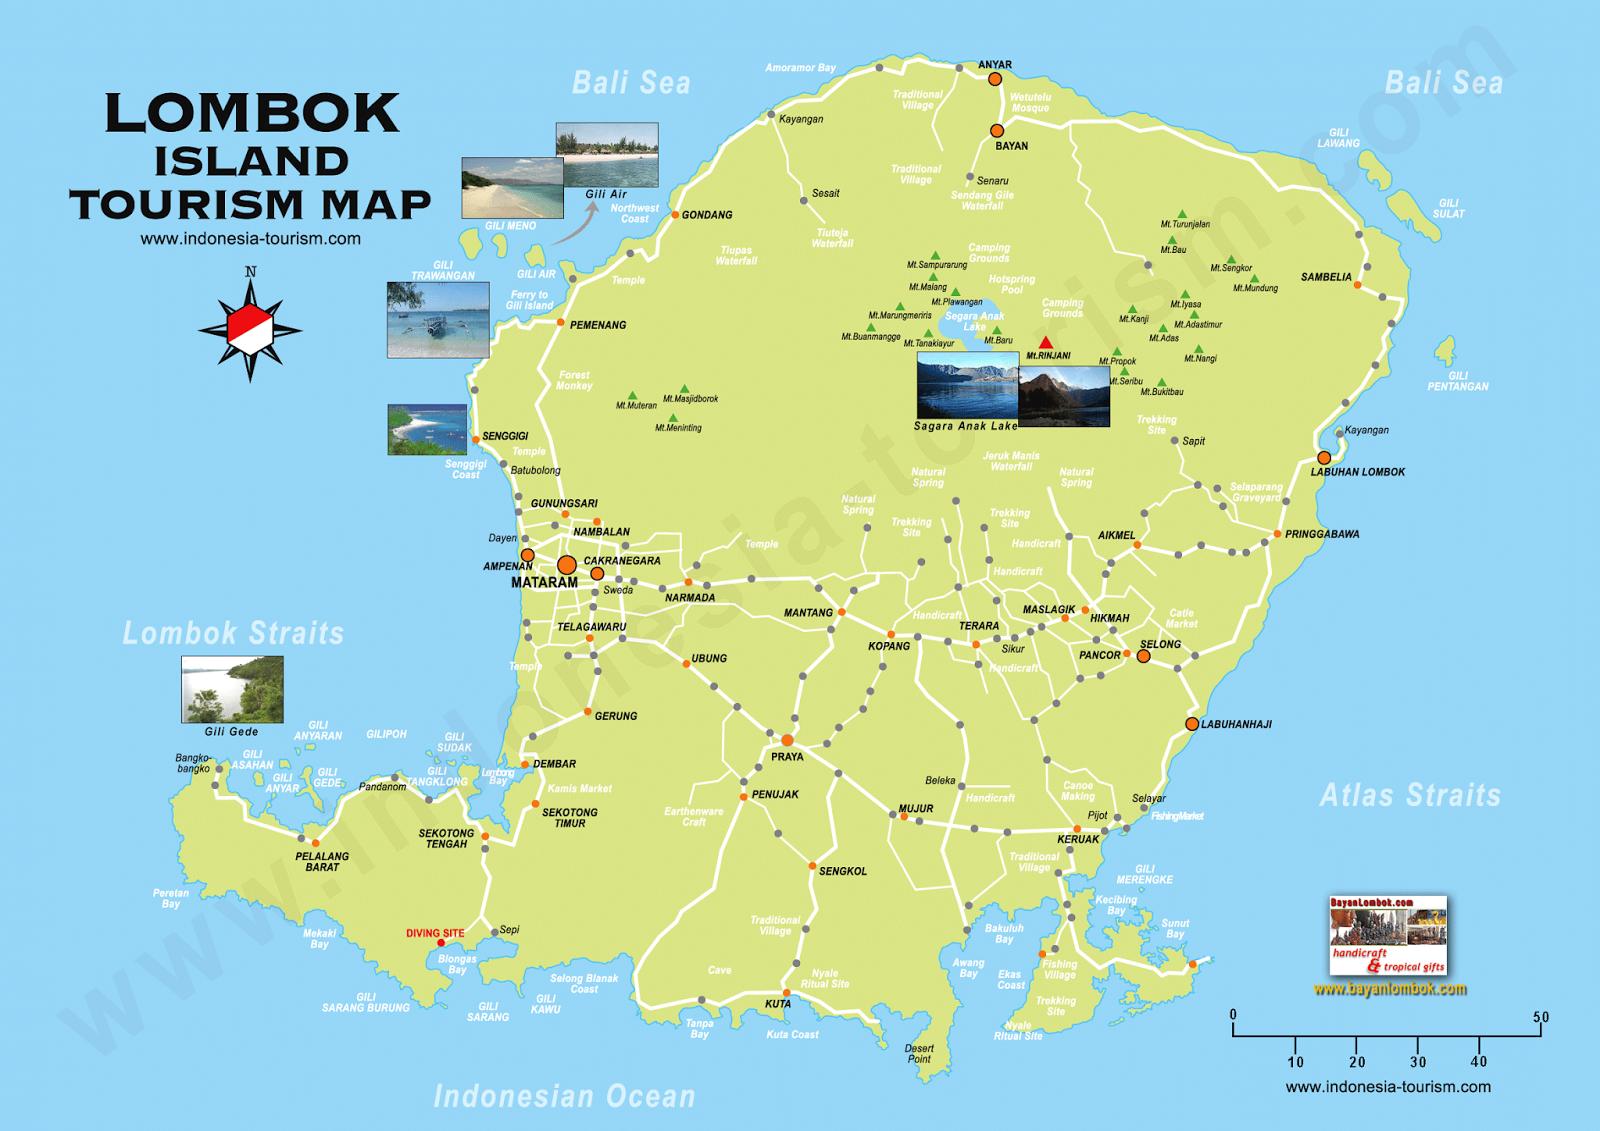 peta wisata lombok Tempat Wisata Menarik di Nusa Tenggara Barat (NTB)